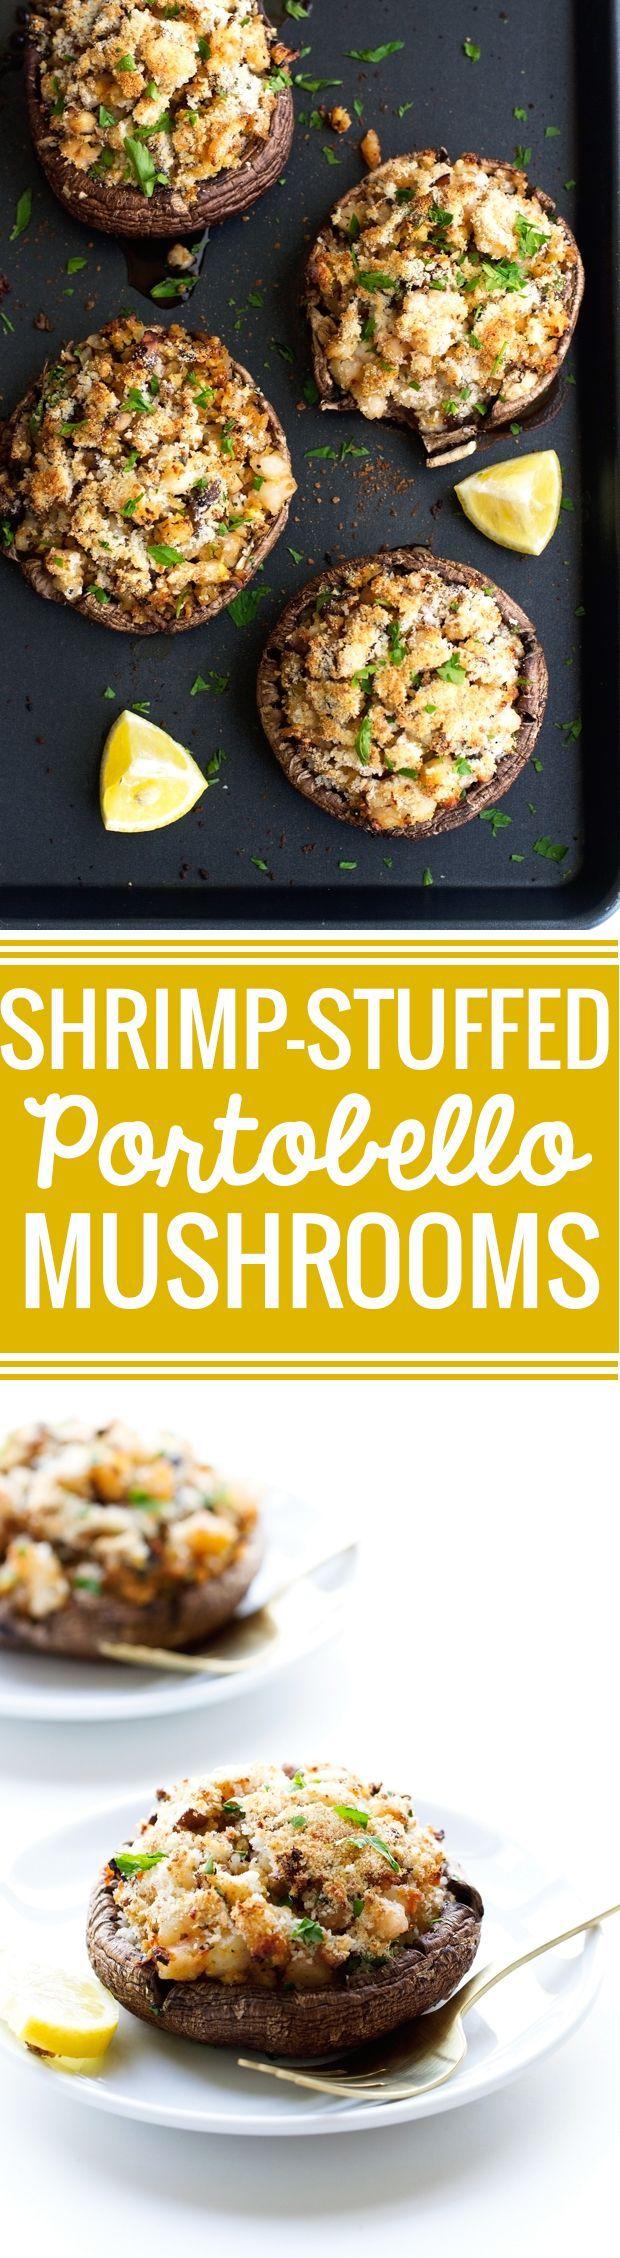 Shrimp Stuffed Portobello Mushrooms - Easy to make, waistline friendly, and just 30 minutes from start to finish! #stuffedmushrooms #shrimp #portobellowmushrooms | Littlespicejar.com